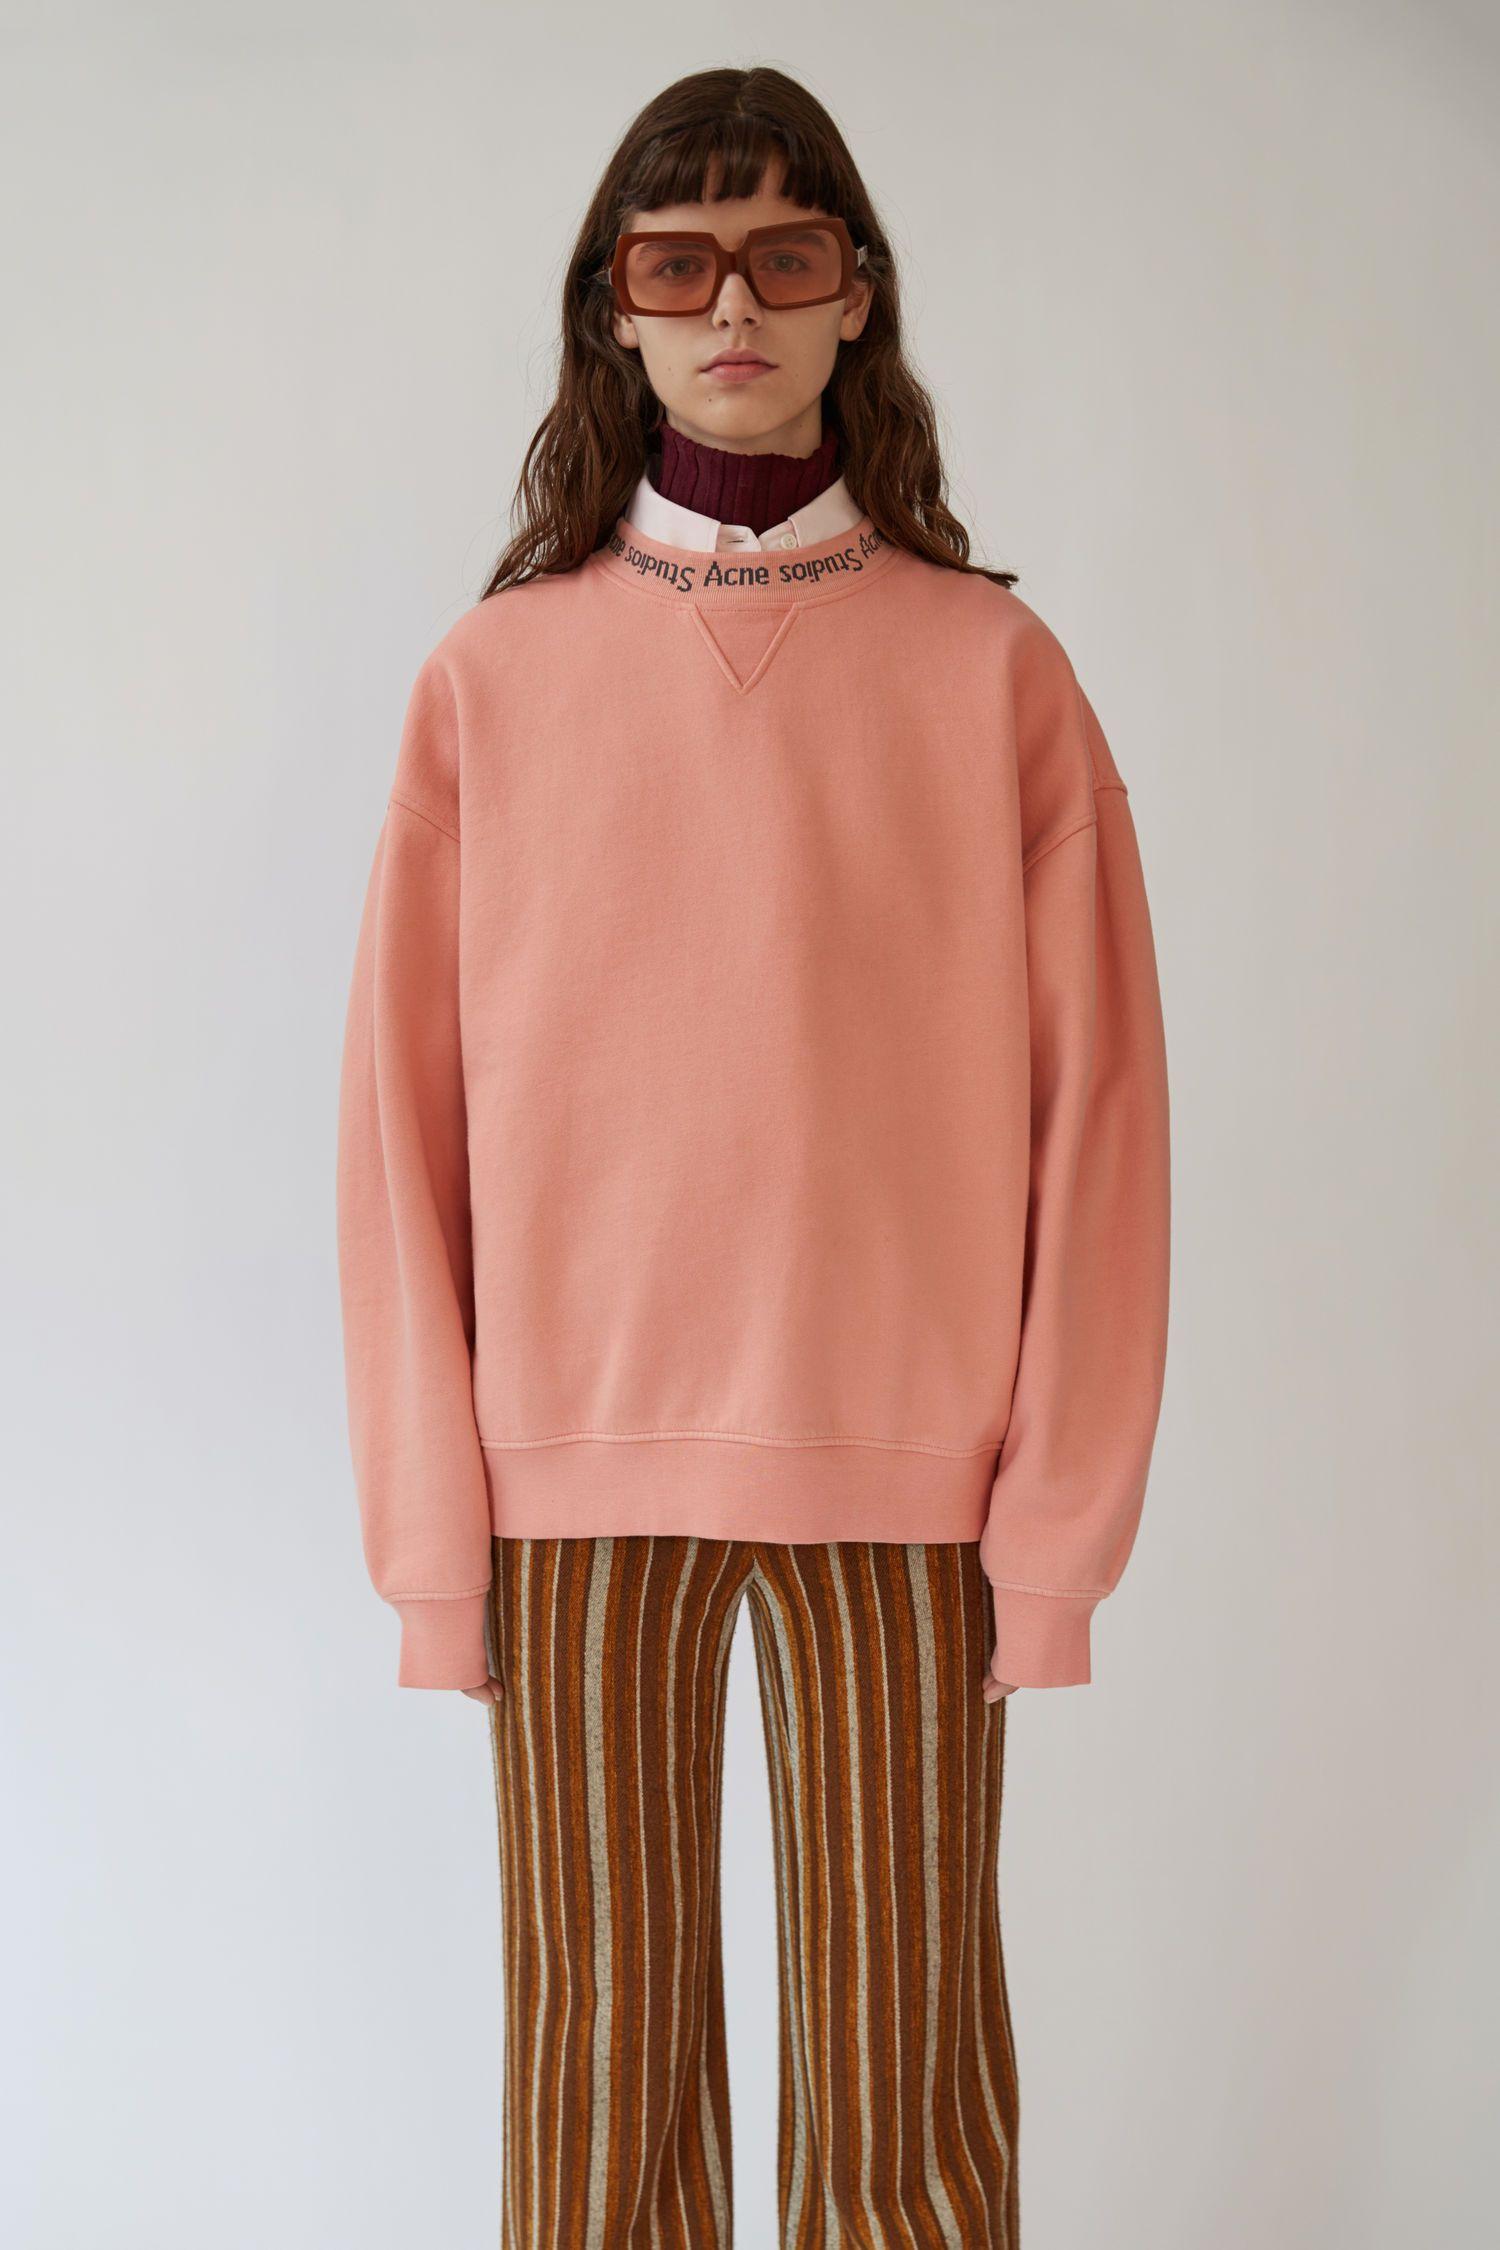 Ready-to-wear Yana rib Light Pink 1500x 001   Fashion   Acne studios ... 982749de98c